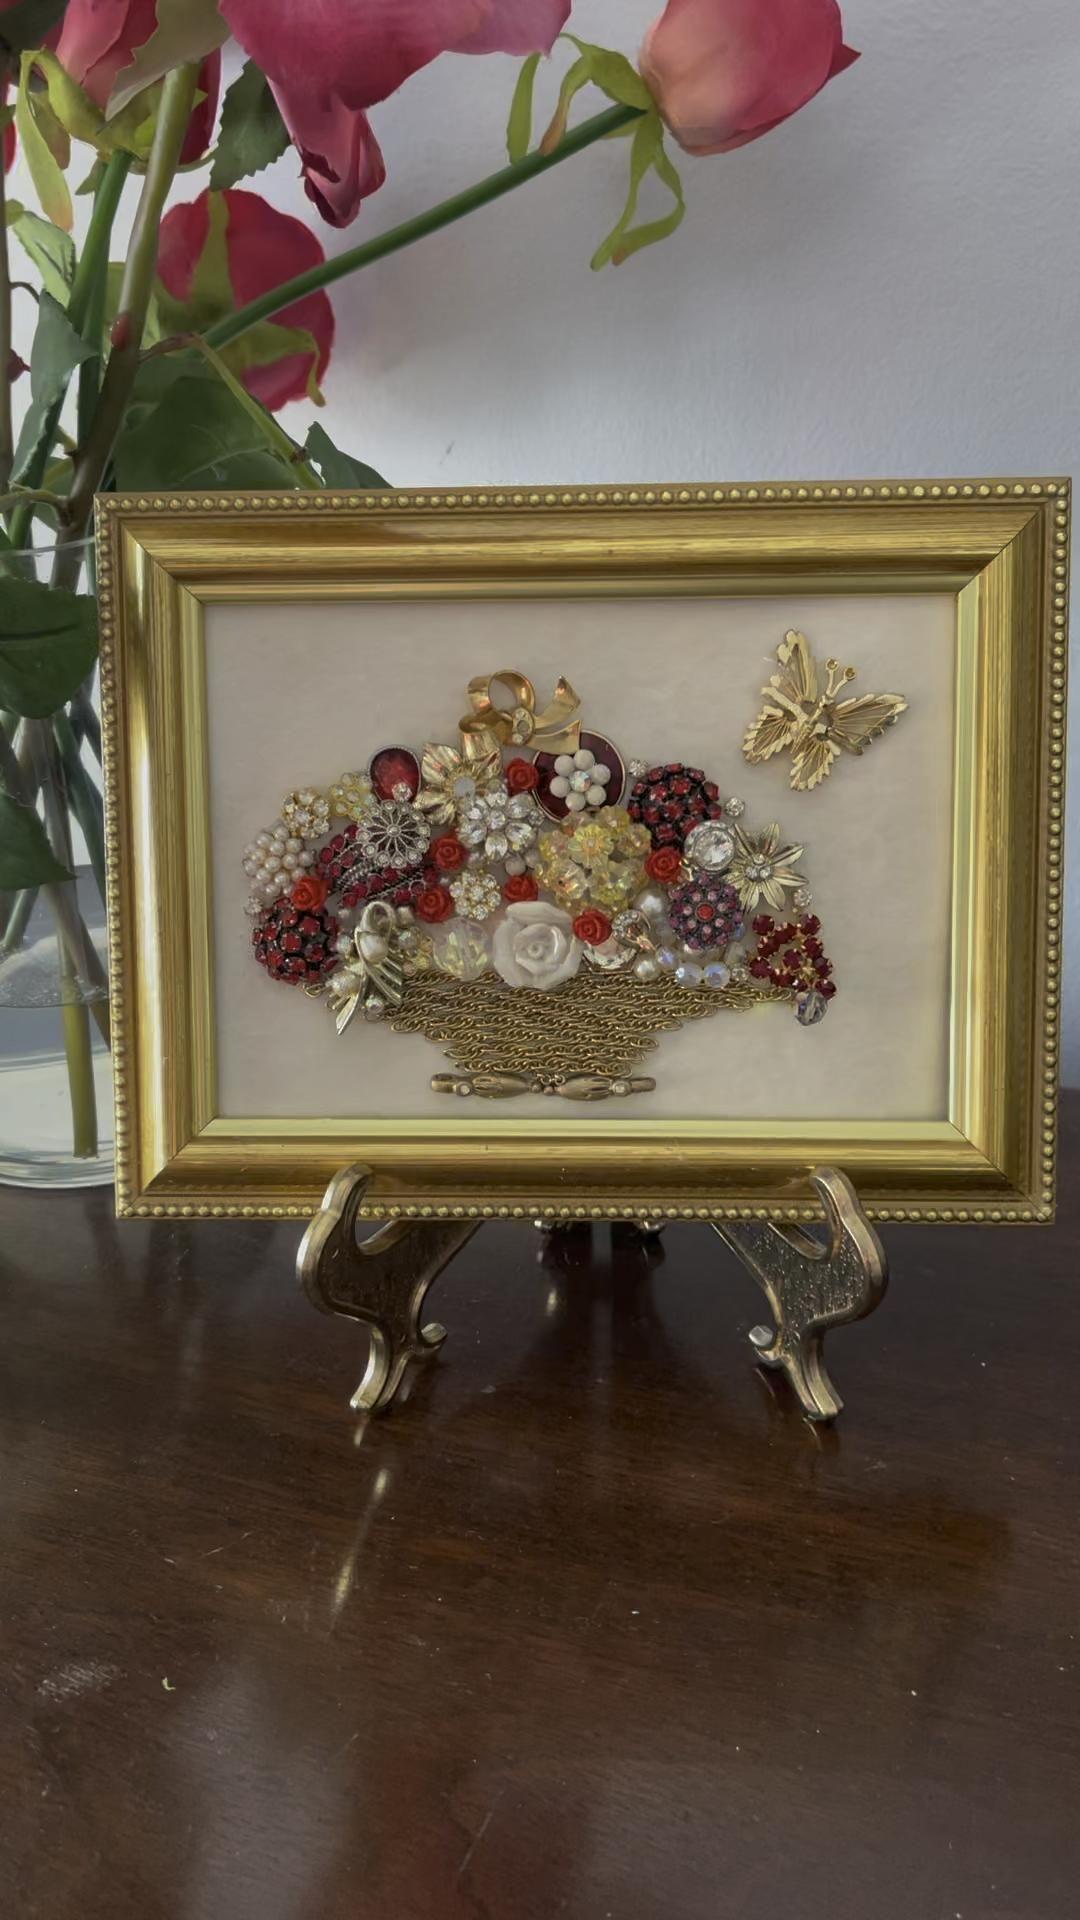 Gift for Her, Jewelry Art Framed  Flower Bouquet B